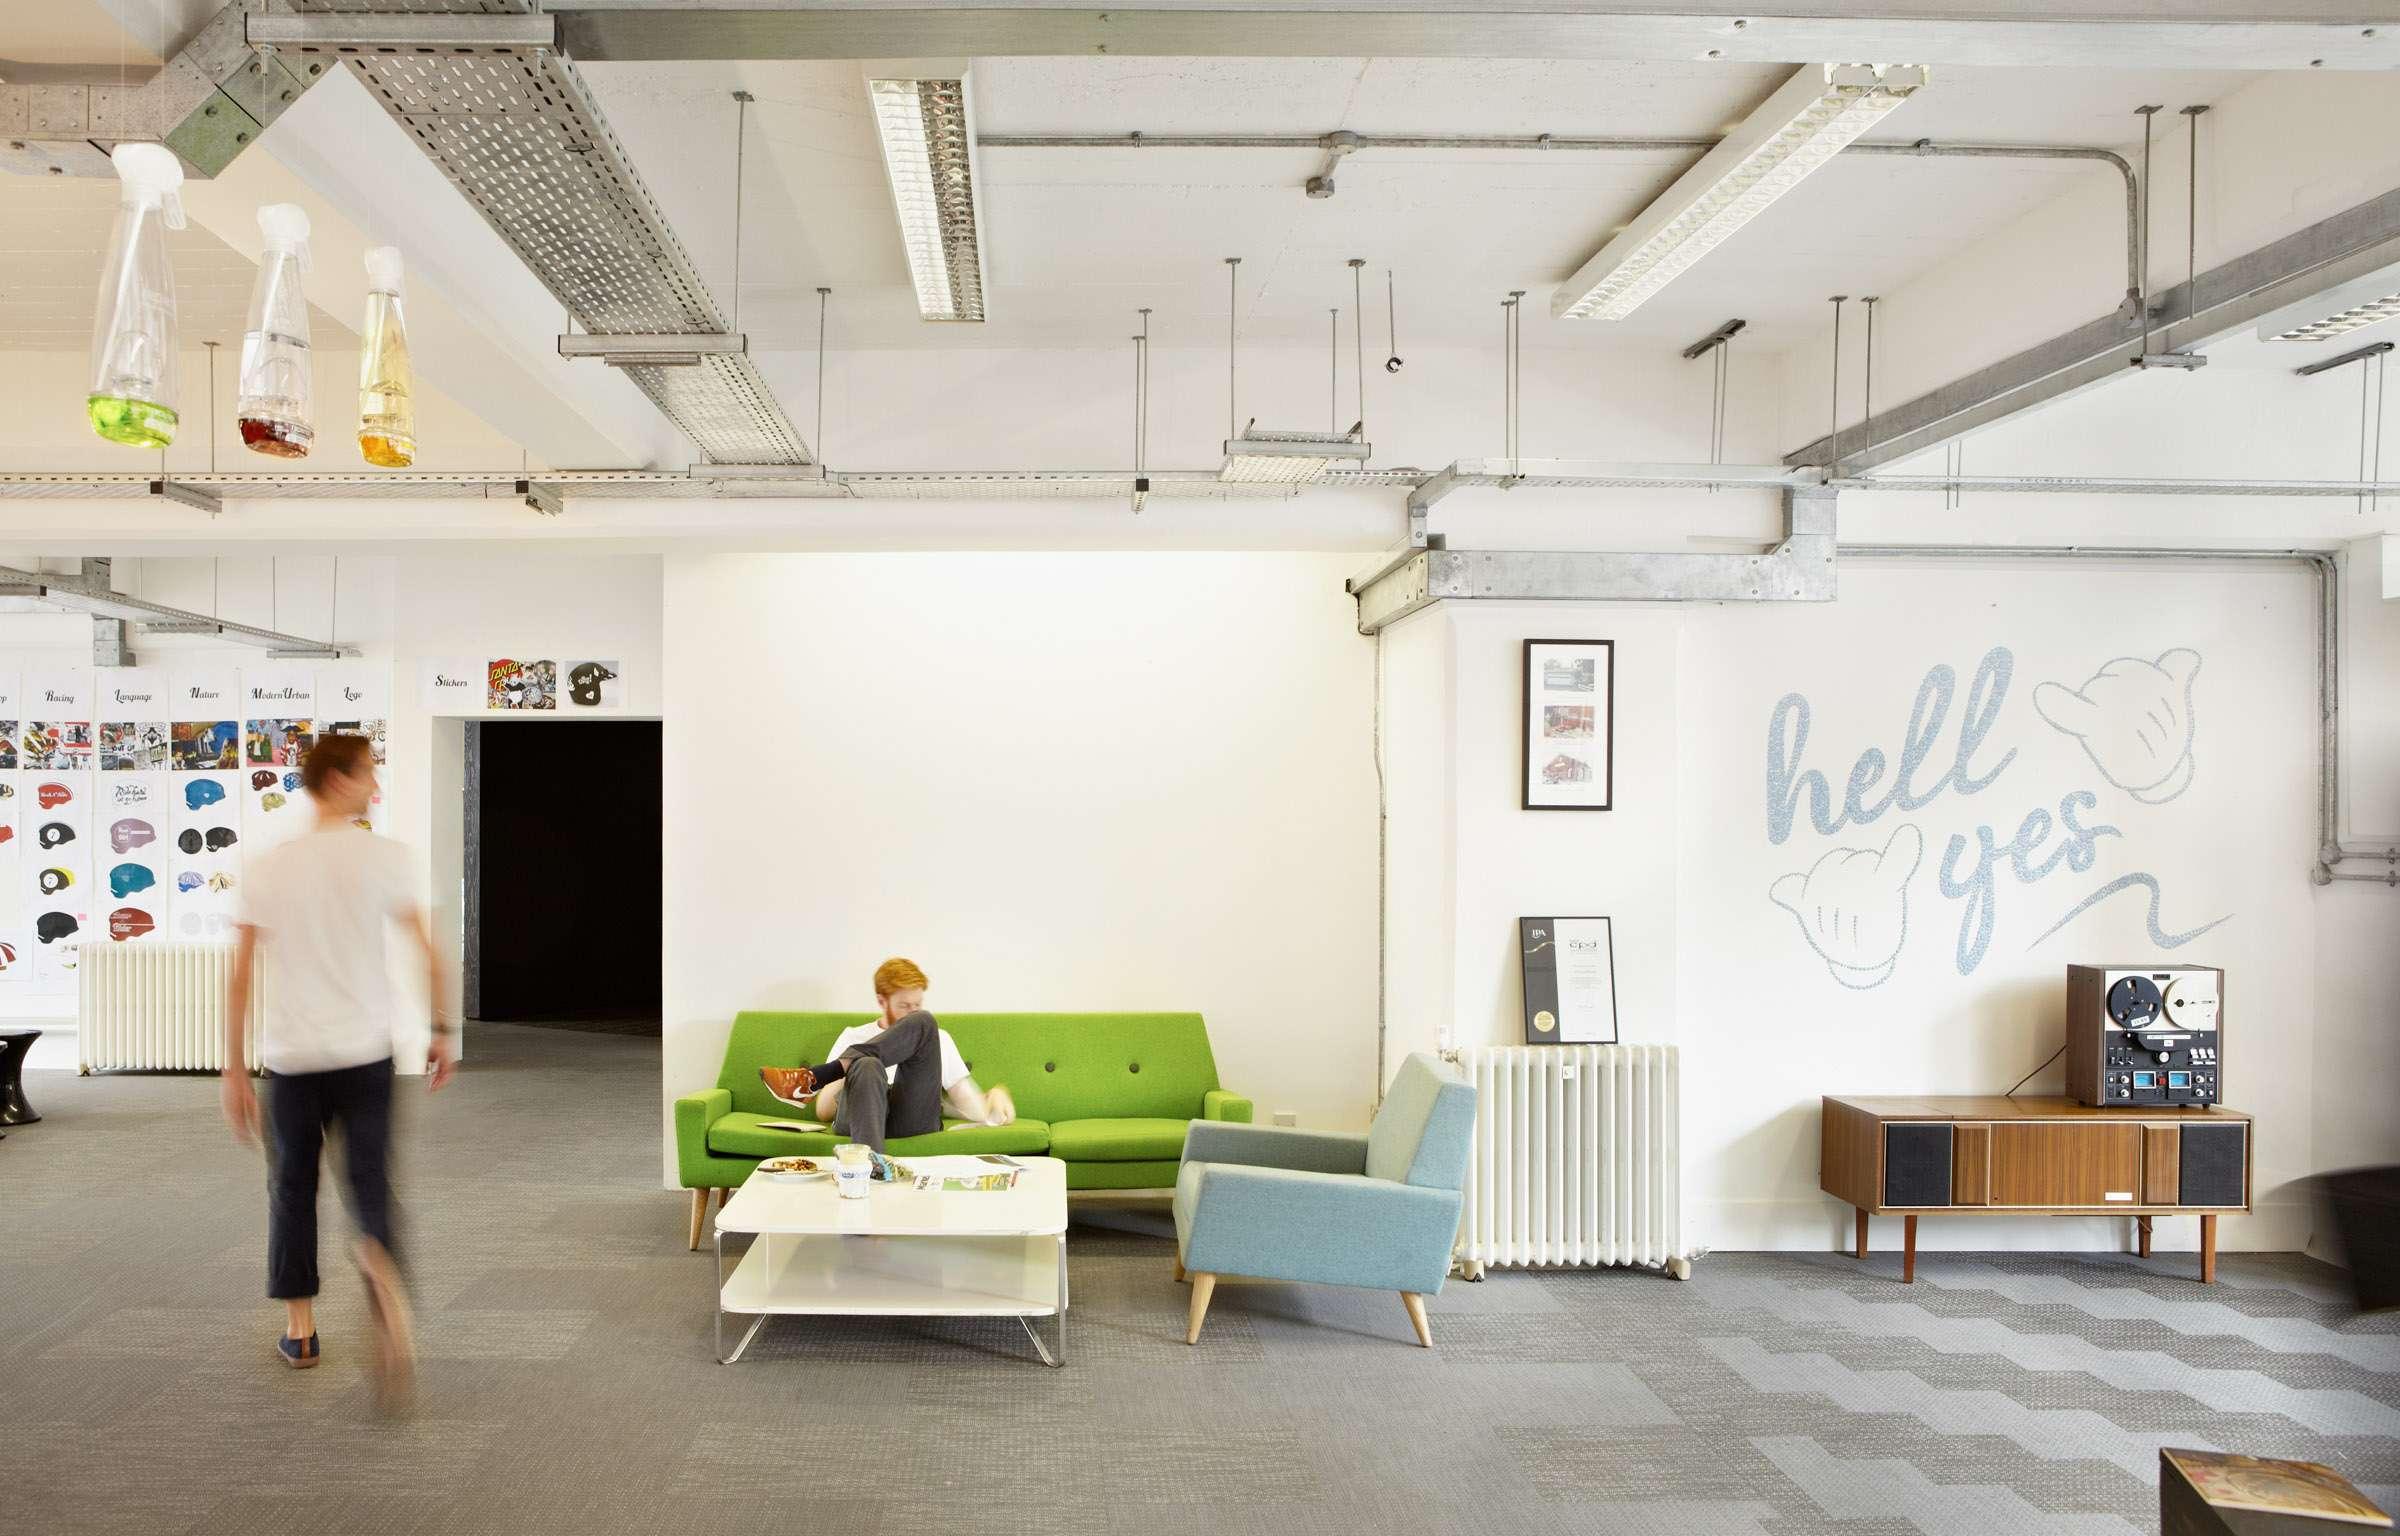 18 Feet & 位于英国伦敦的办公室